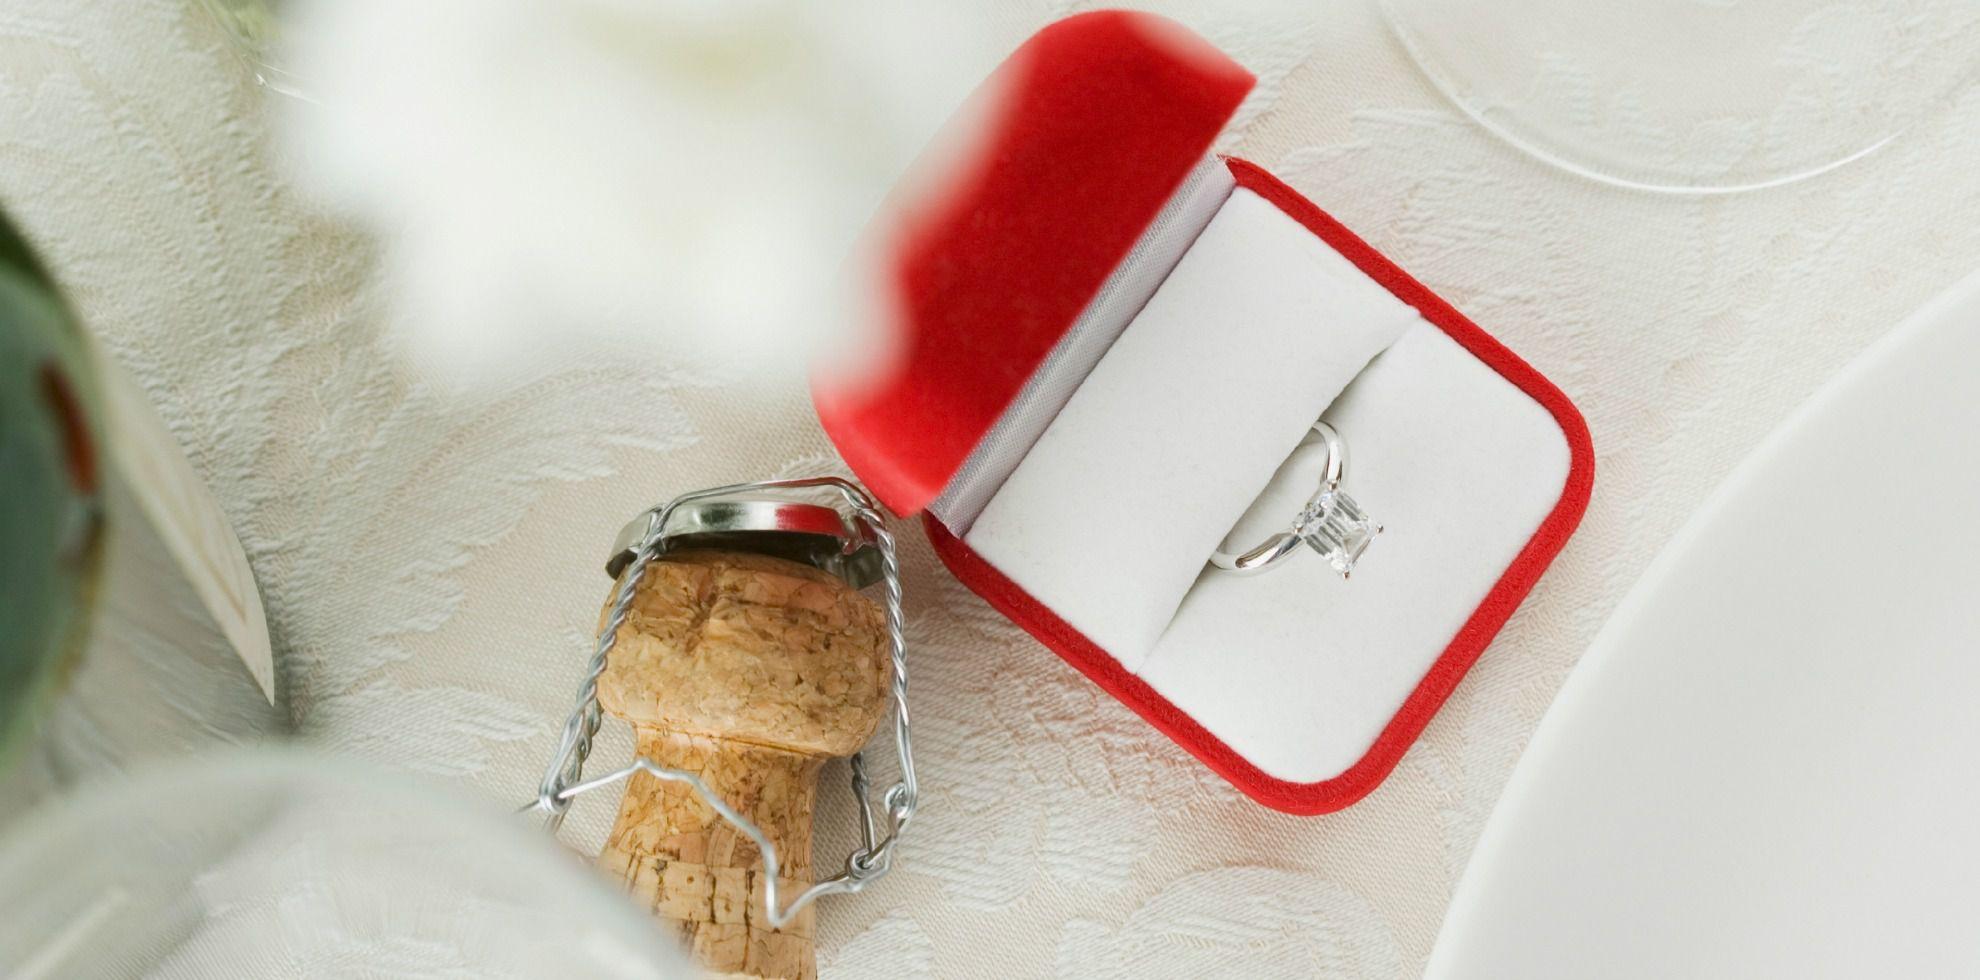 heiratsantrag machen wo trägt man den verlobungsring